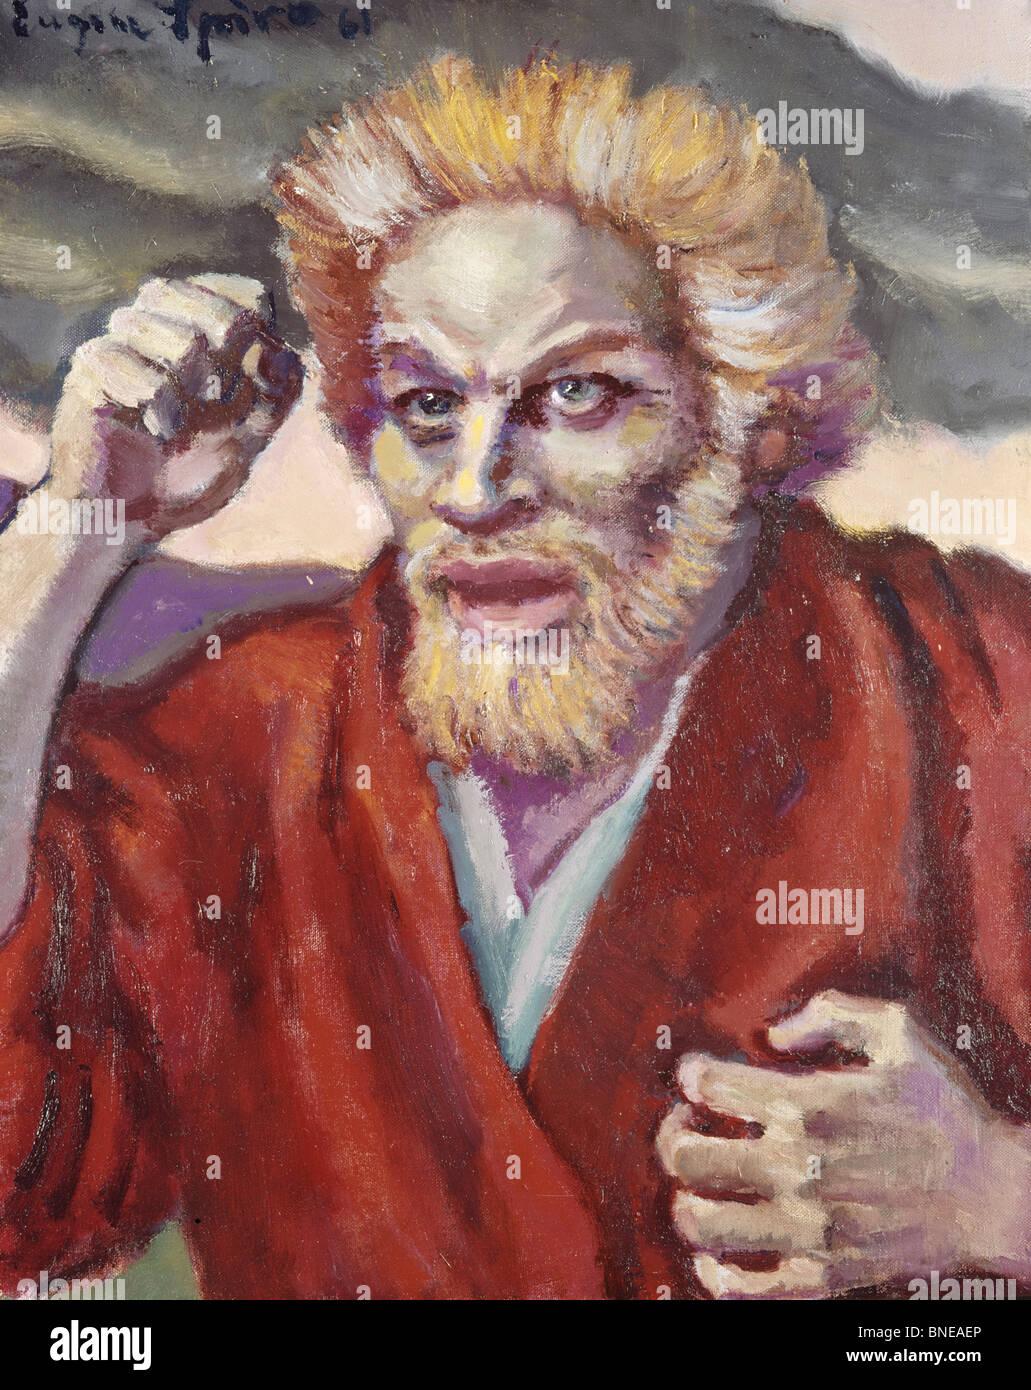 Zephaniah by Eugen Spiro, 1874-1972 - Stock Image